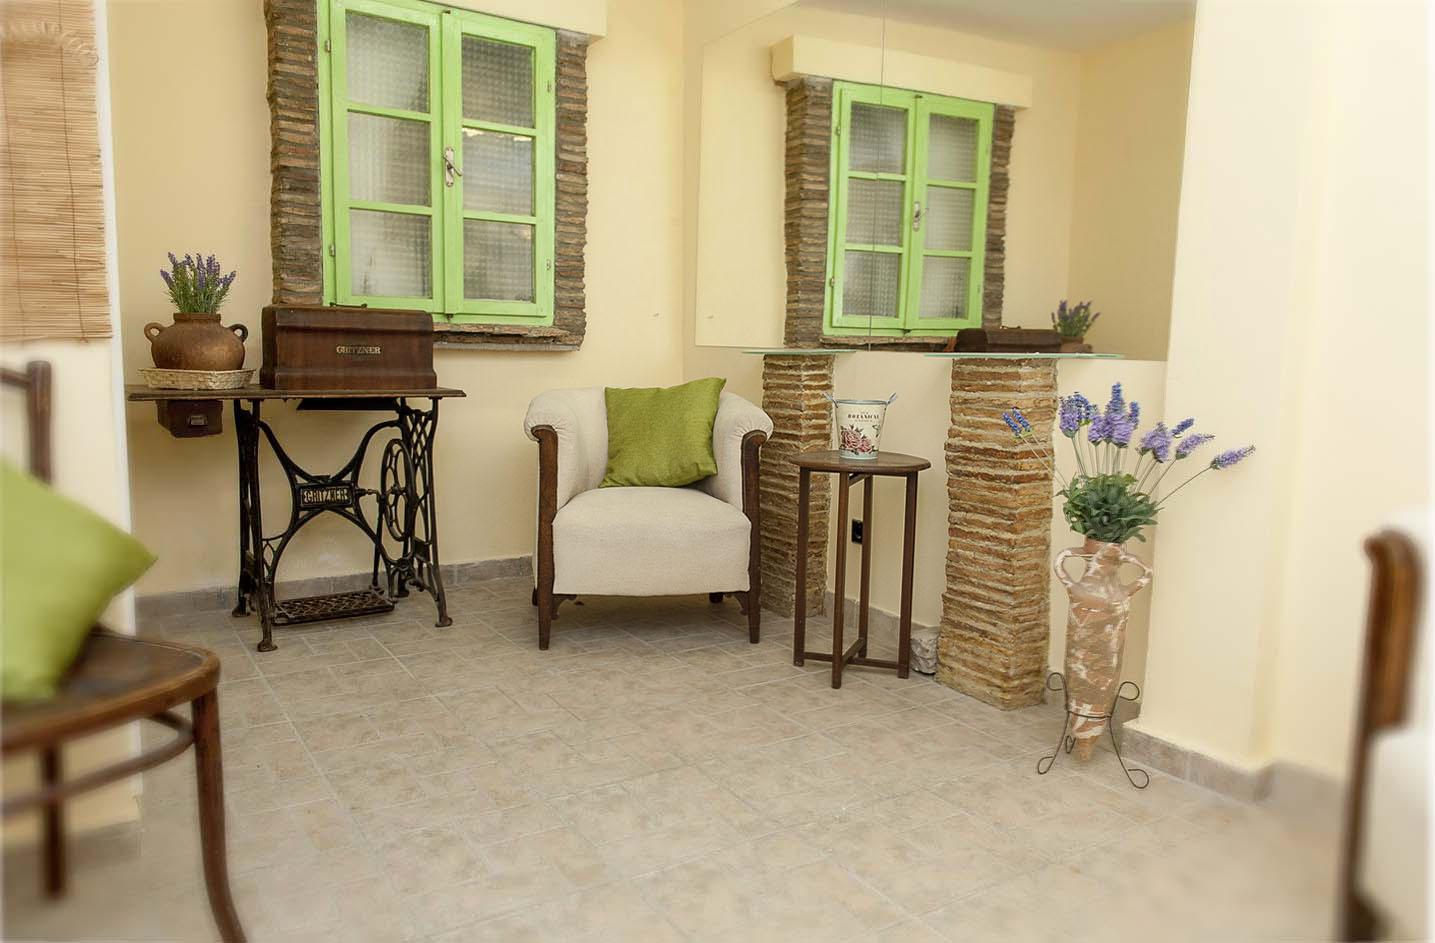 Tanga Apartments In Rovinj Croatia Situated In The Old